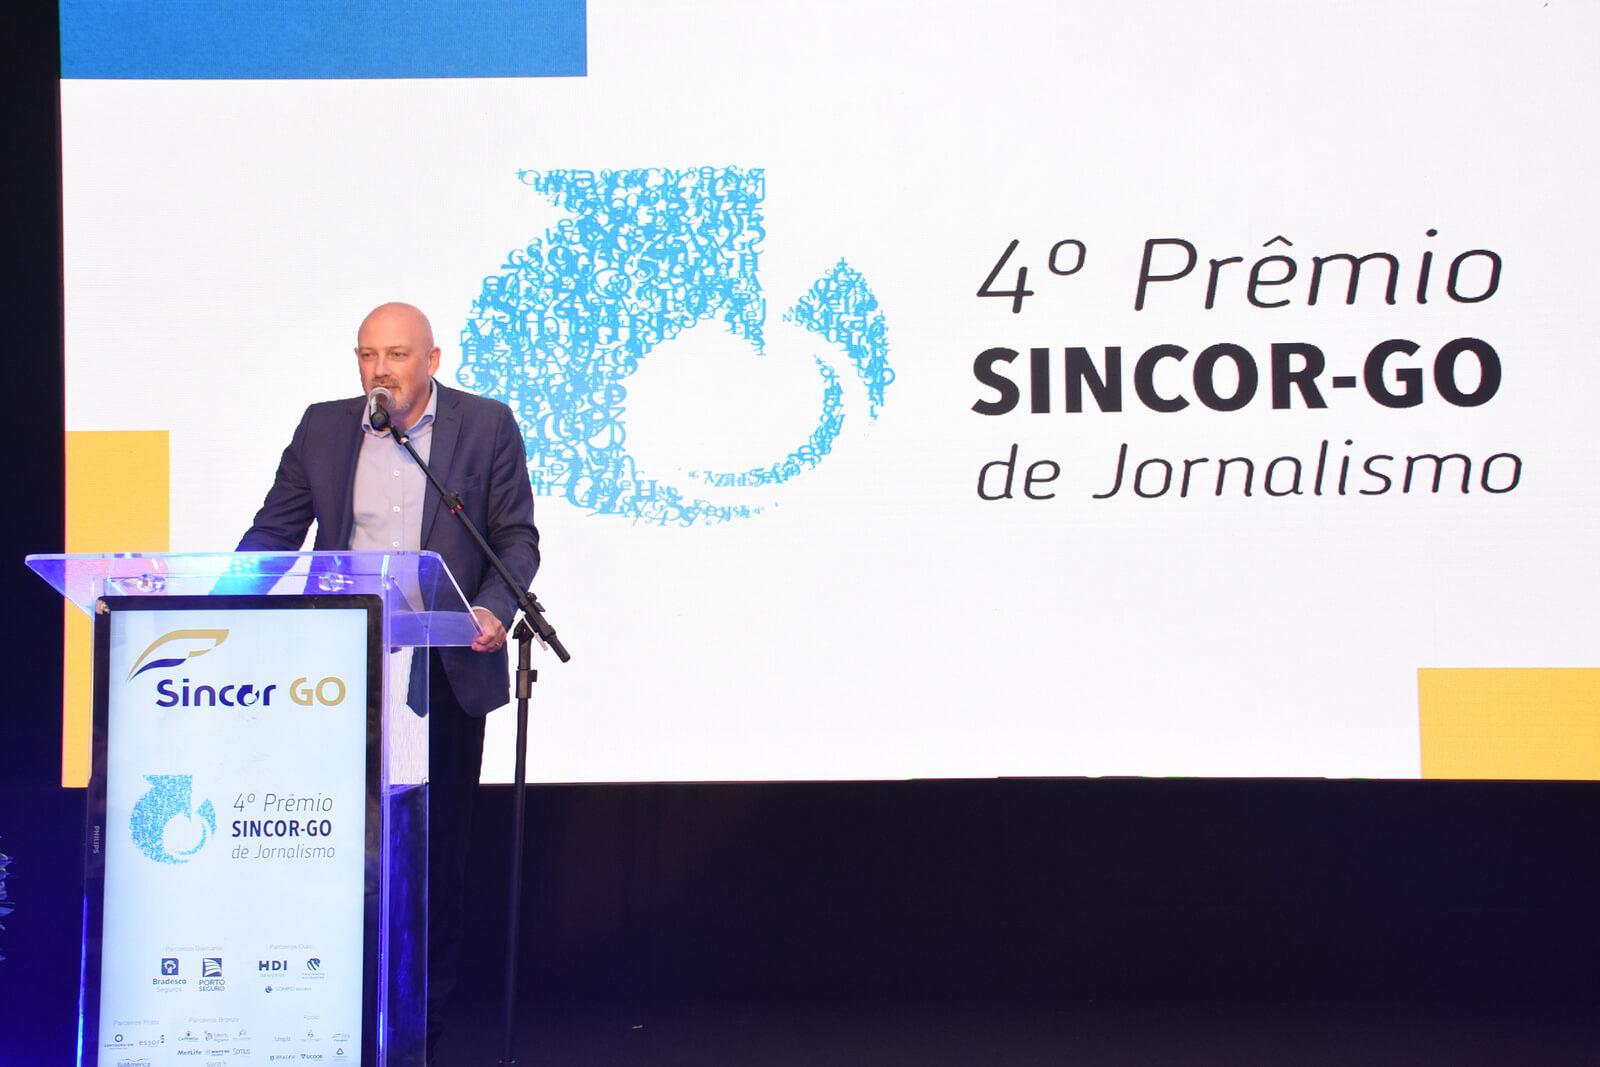 Prêmio Sincor-GO